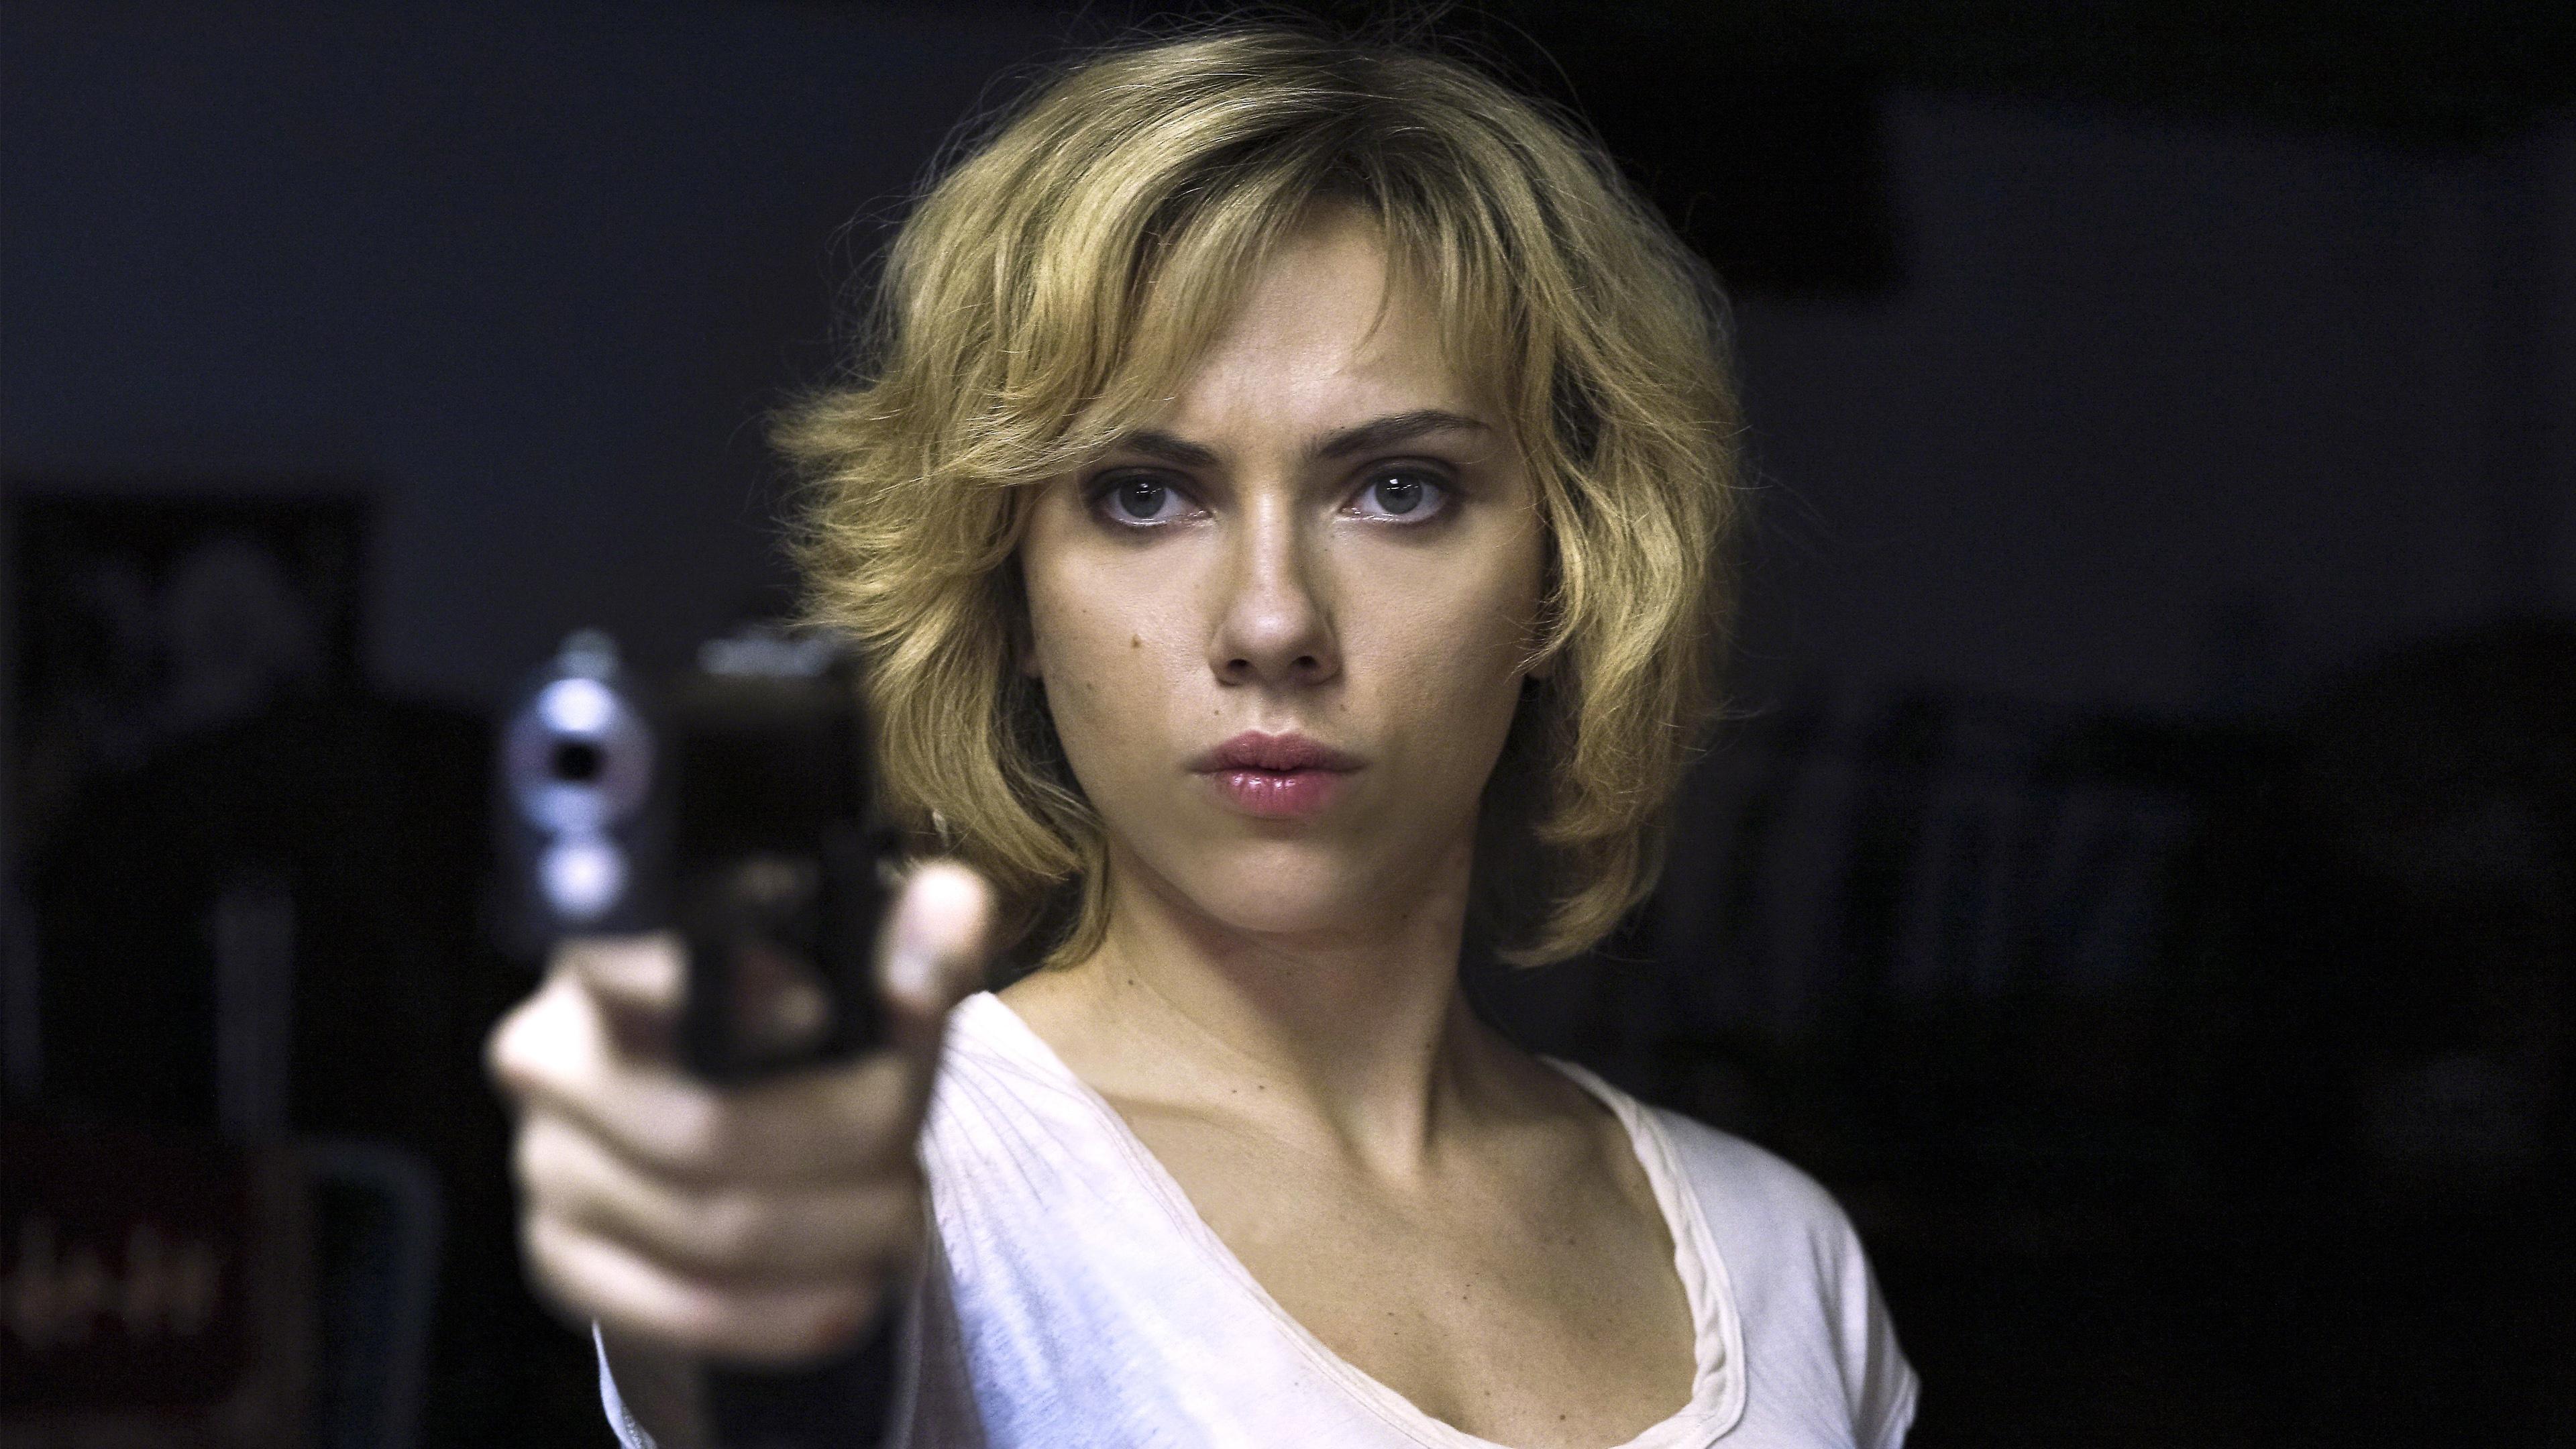 Scarlett Johansson Lucy Wallpapers Hd Wallpapers